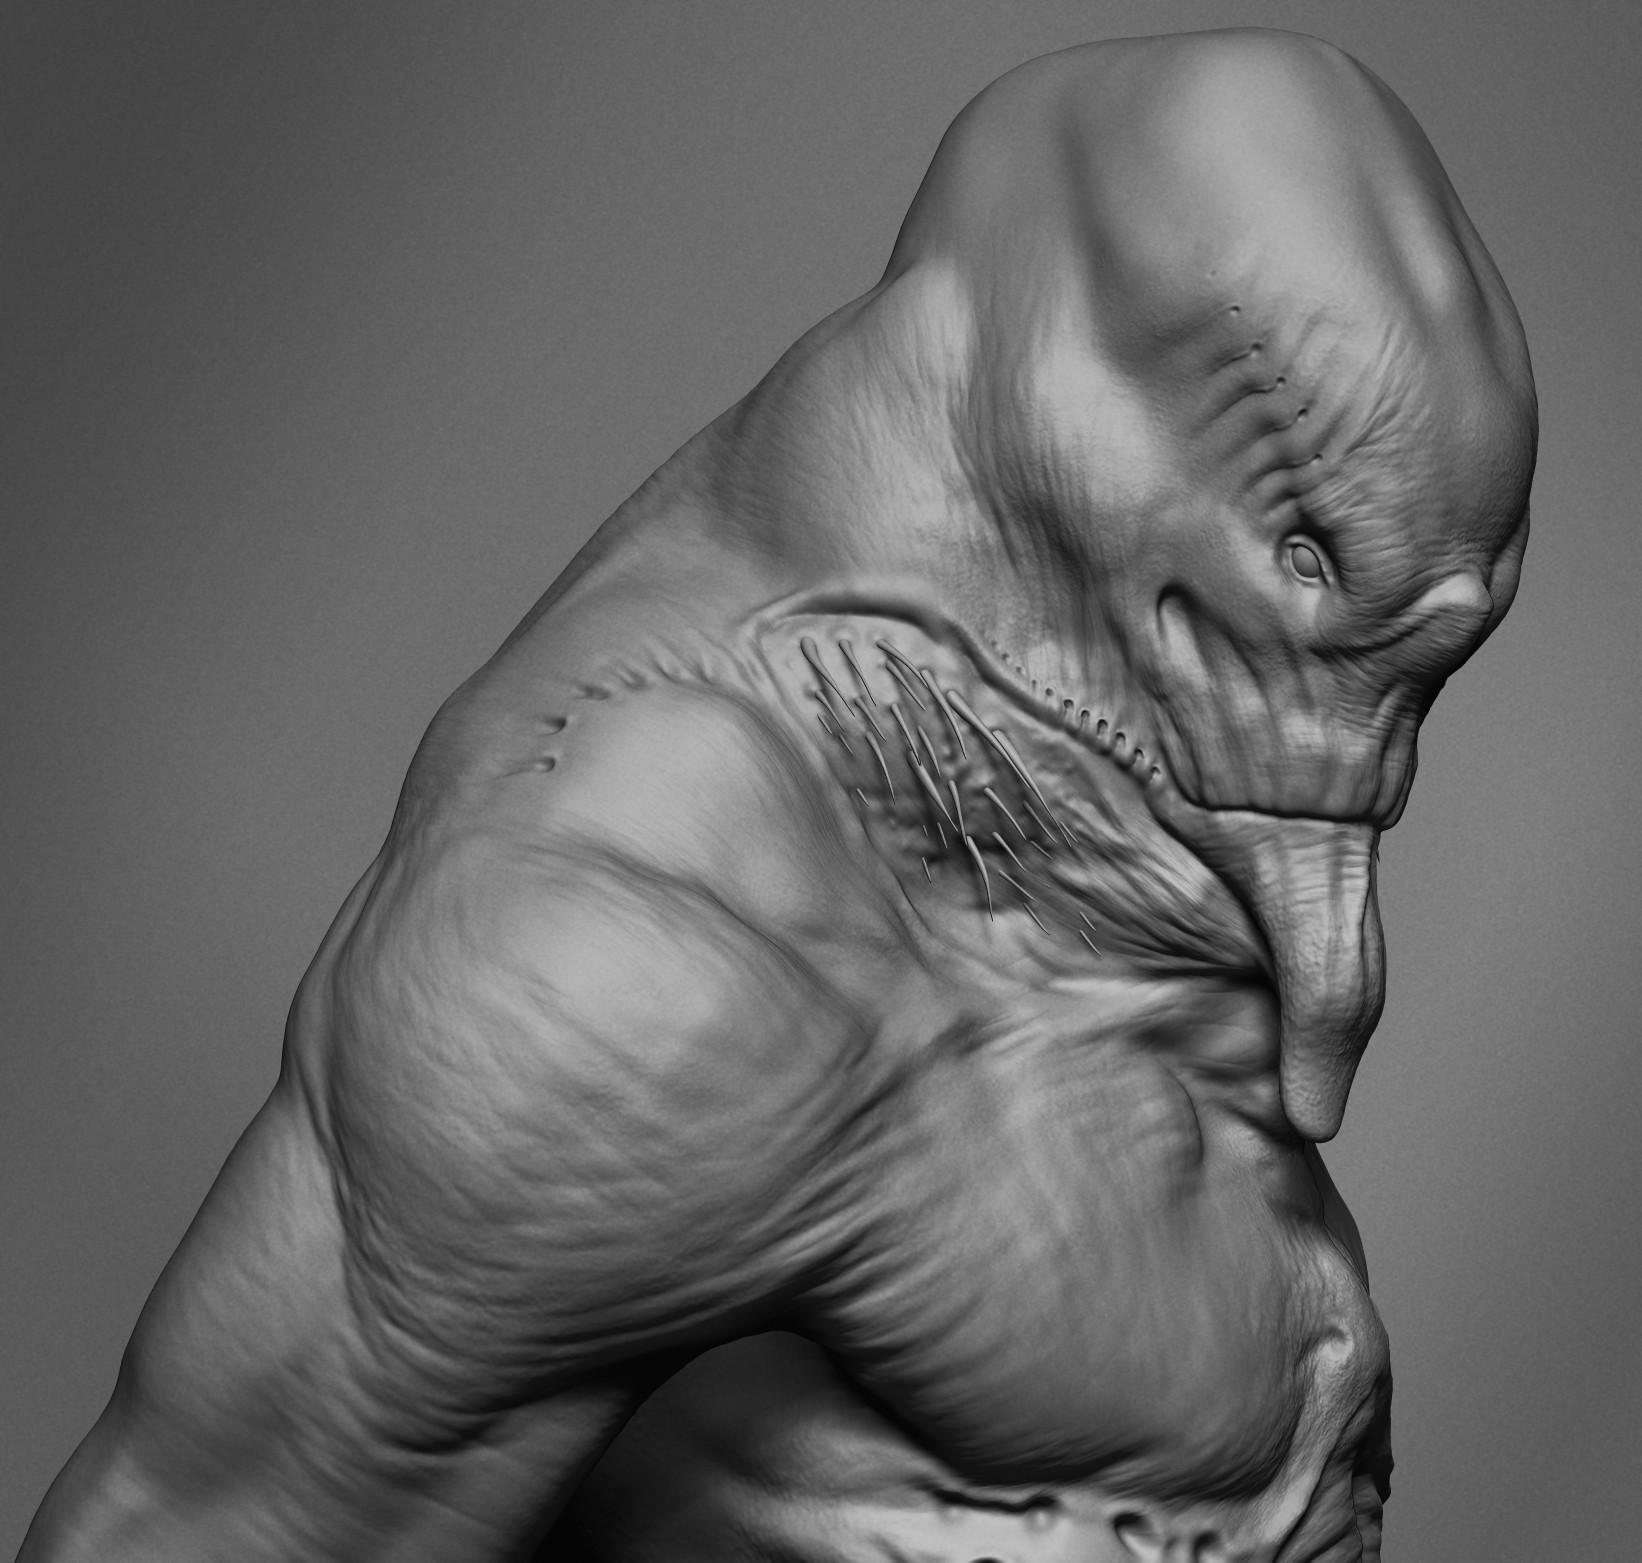 Vince rizzi creature sketch001 b